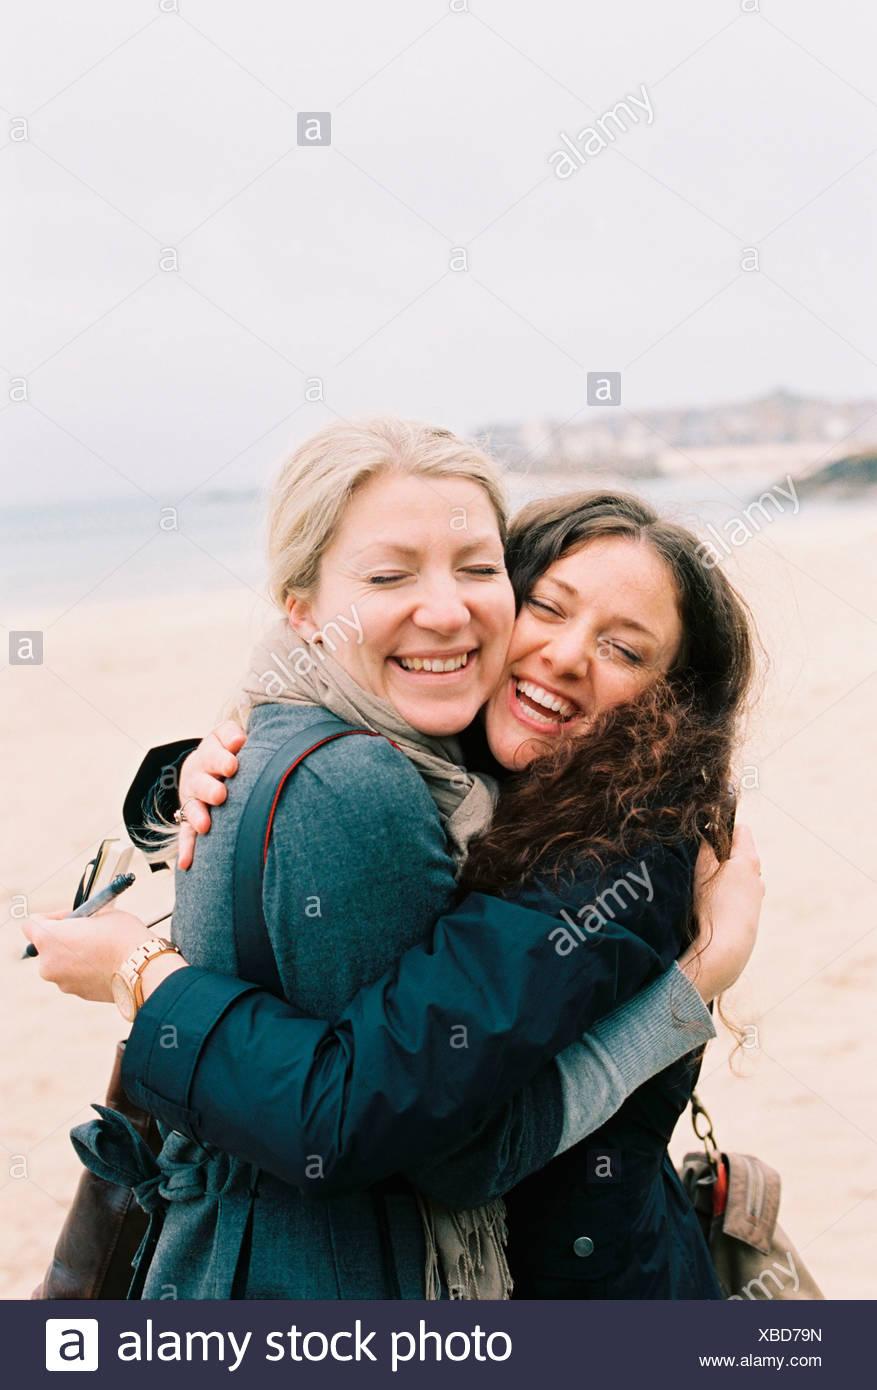 Two women cheek to cheek hugging on a beach. - Stock Image